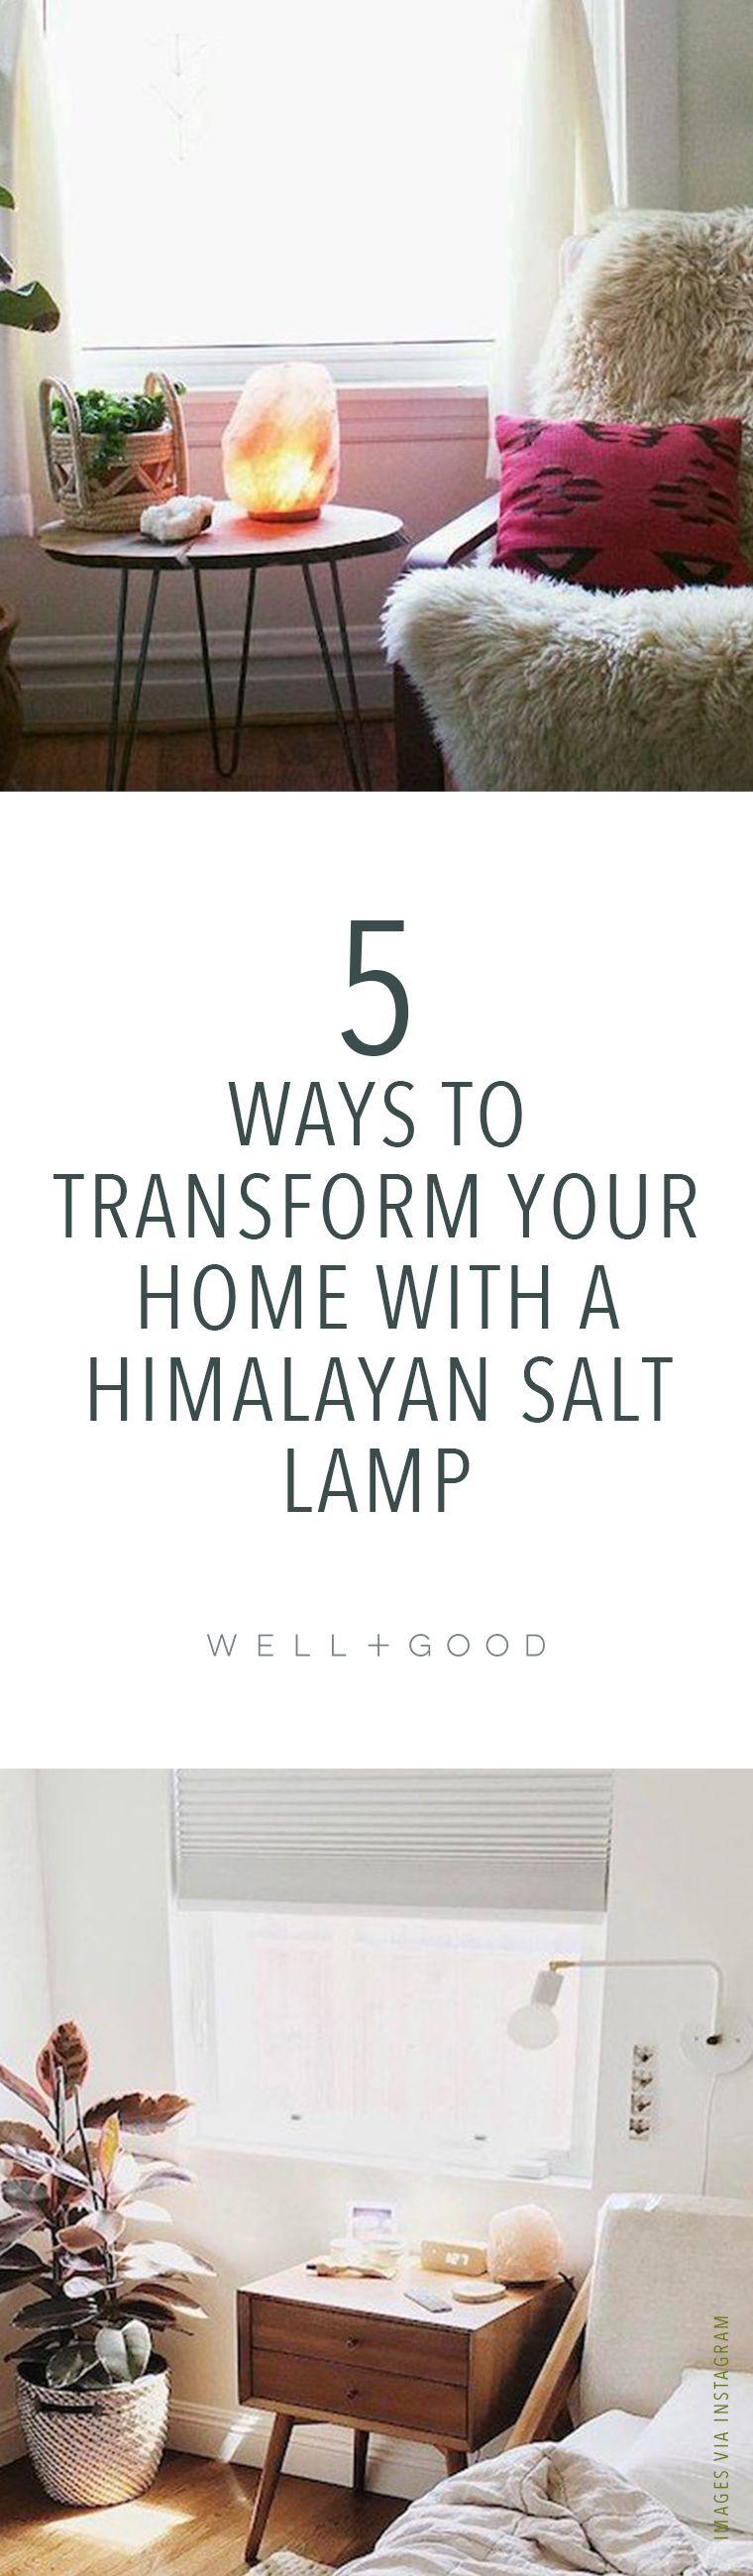 5 Ways To Transform Your Home With A Himalayan Salt Lamp Muebles  # Muebles Himalaya